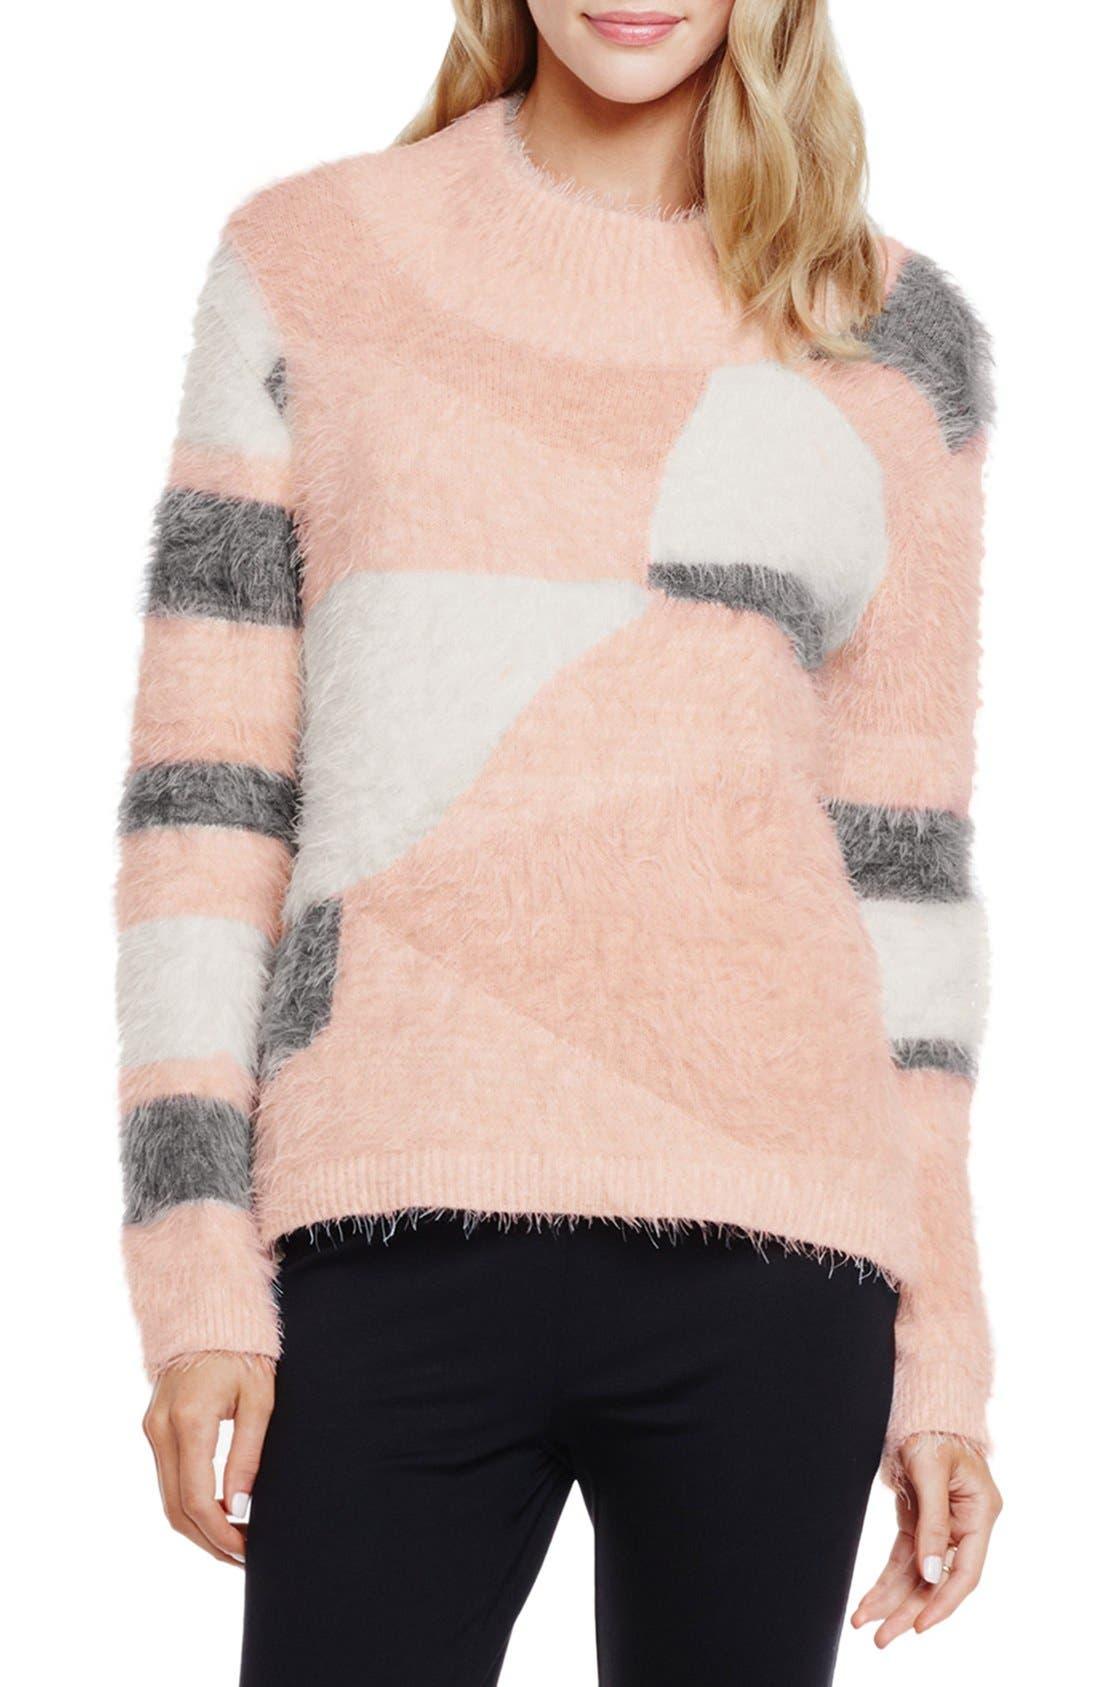 Alternate Image 1 Selected - Vince Camuto Mixed Yarn Intarsia Turtleneck Eyelash Sweater